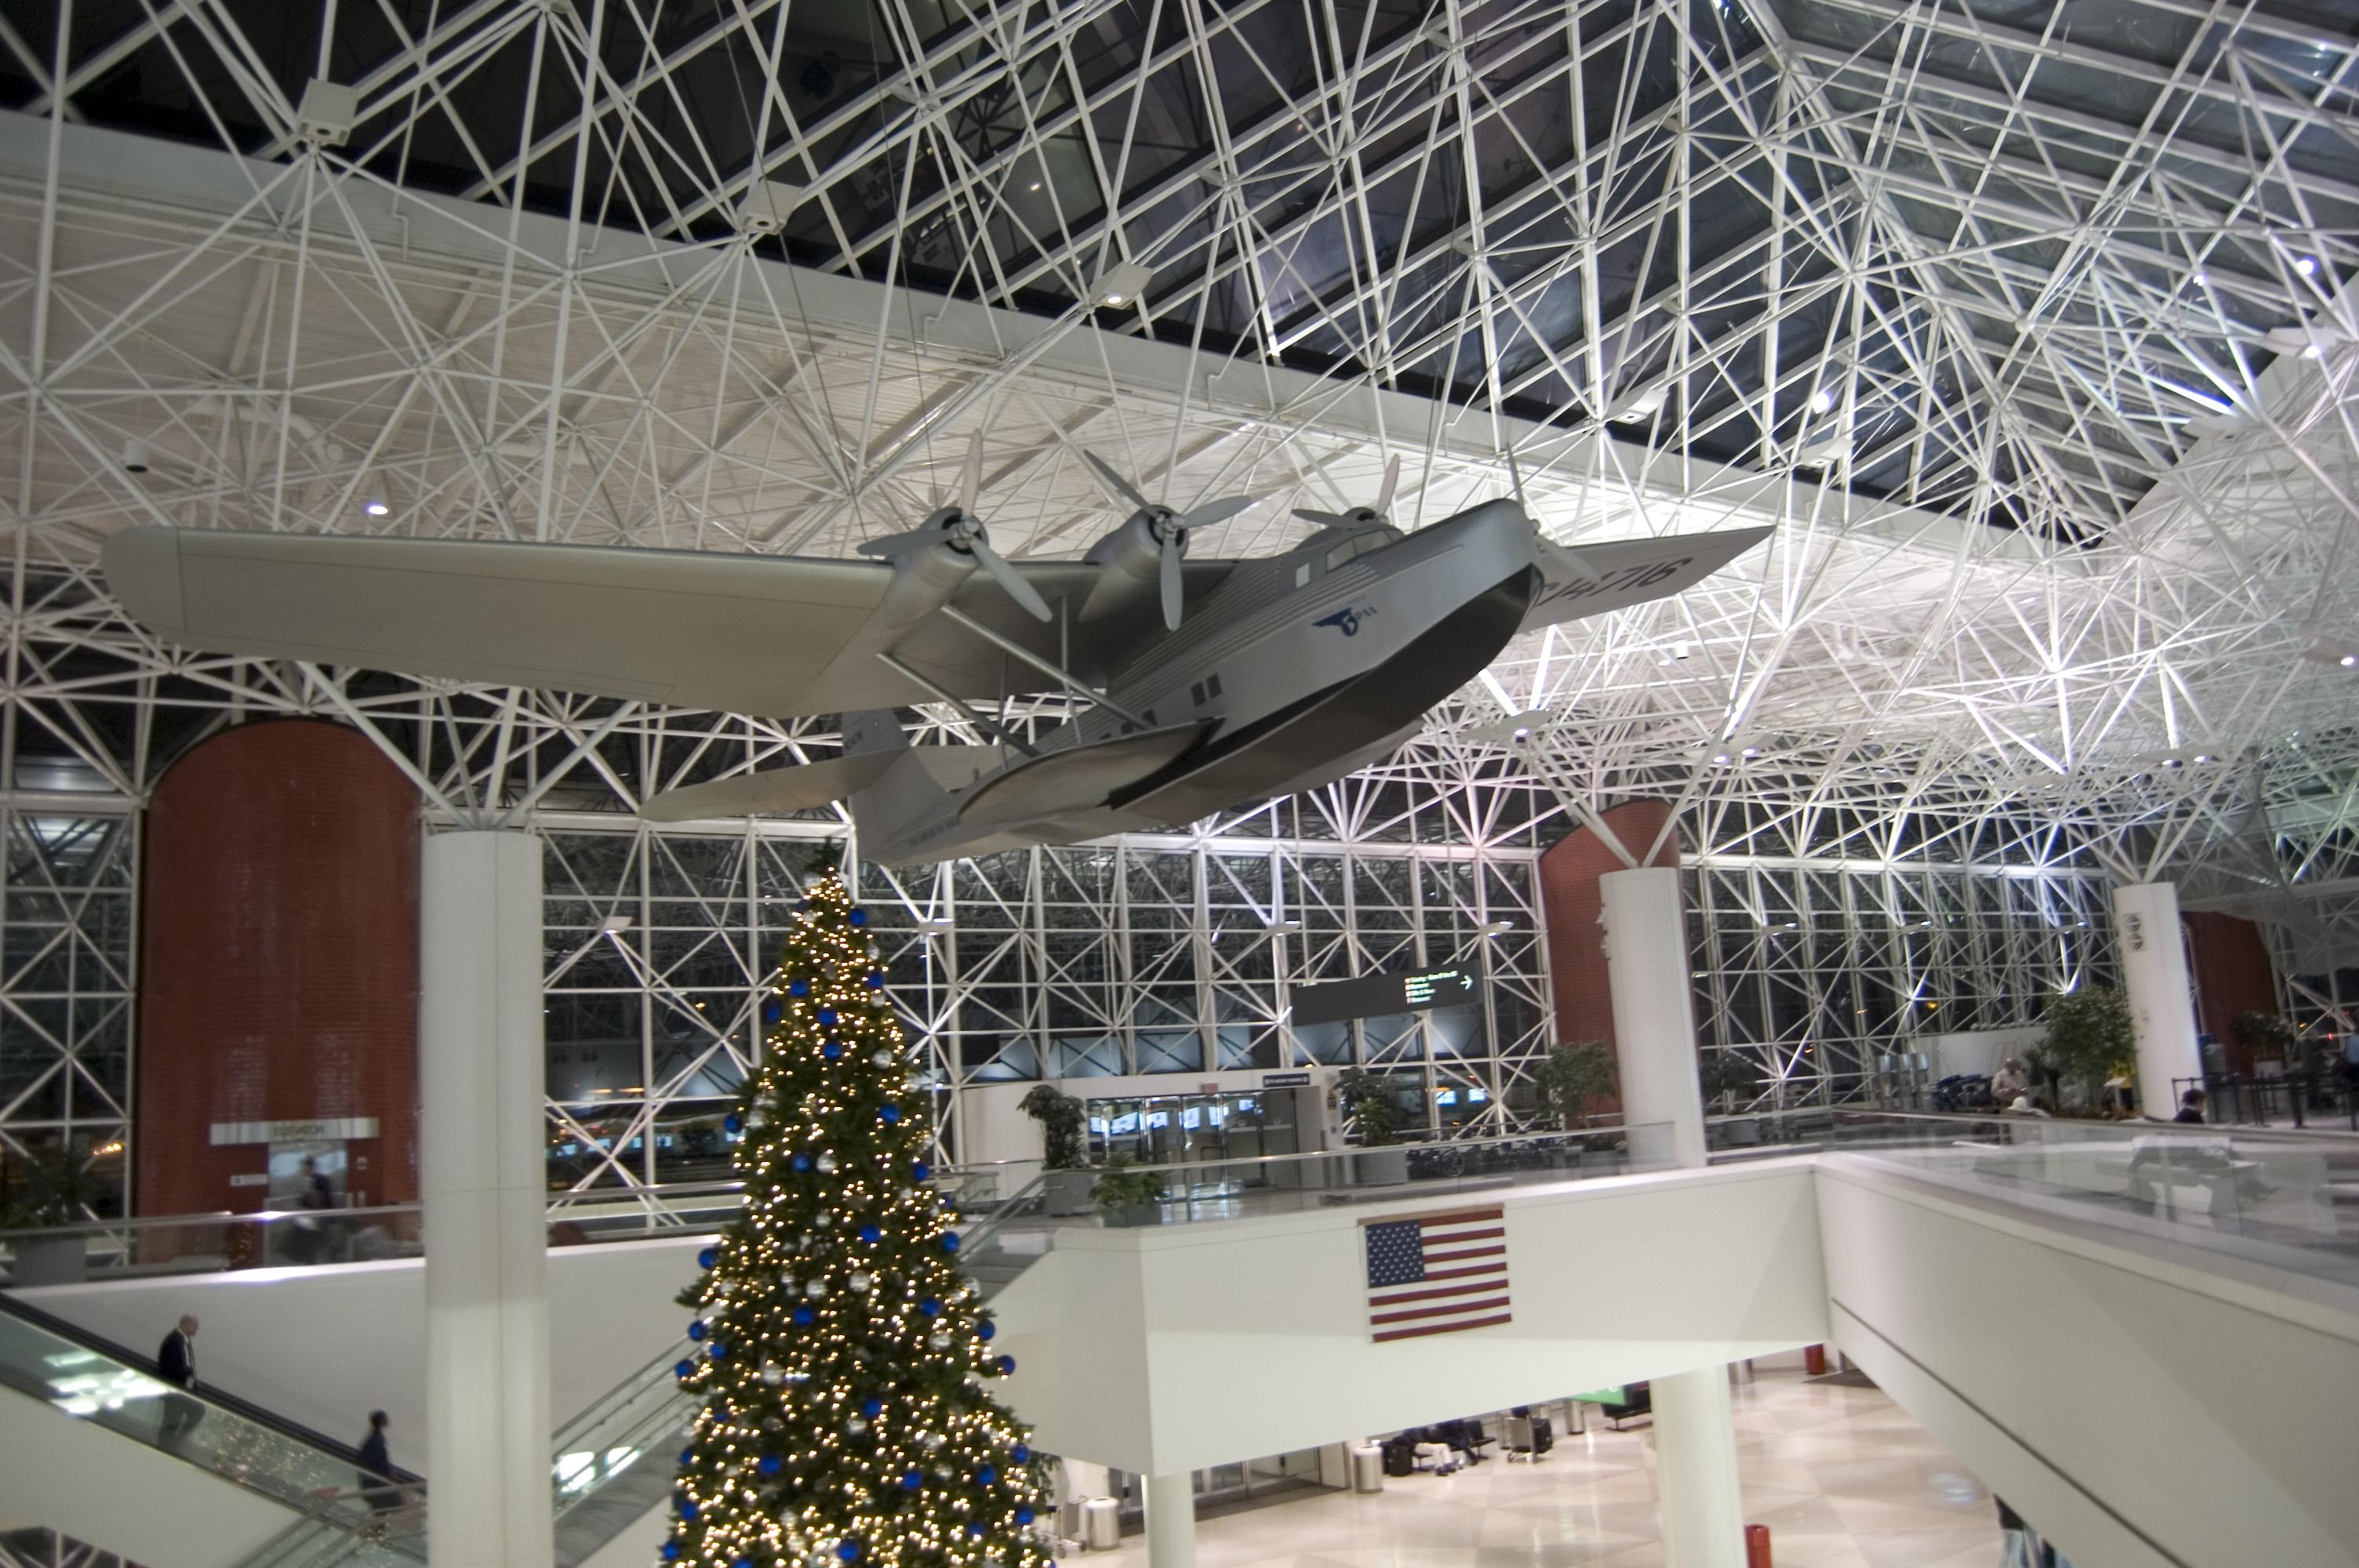 Baltimore Washington International Thurgood Marshal Airport